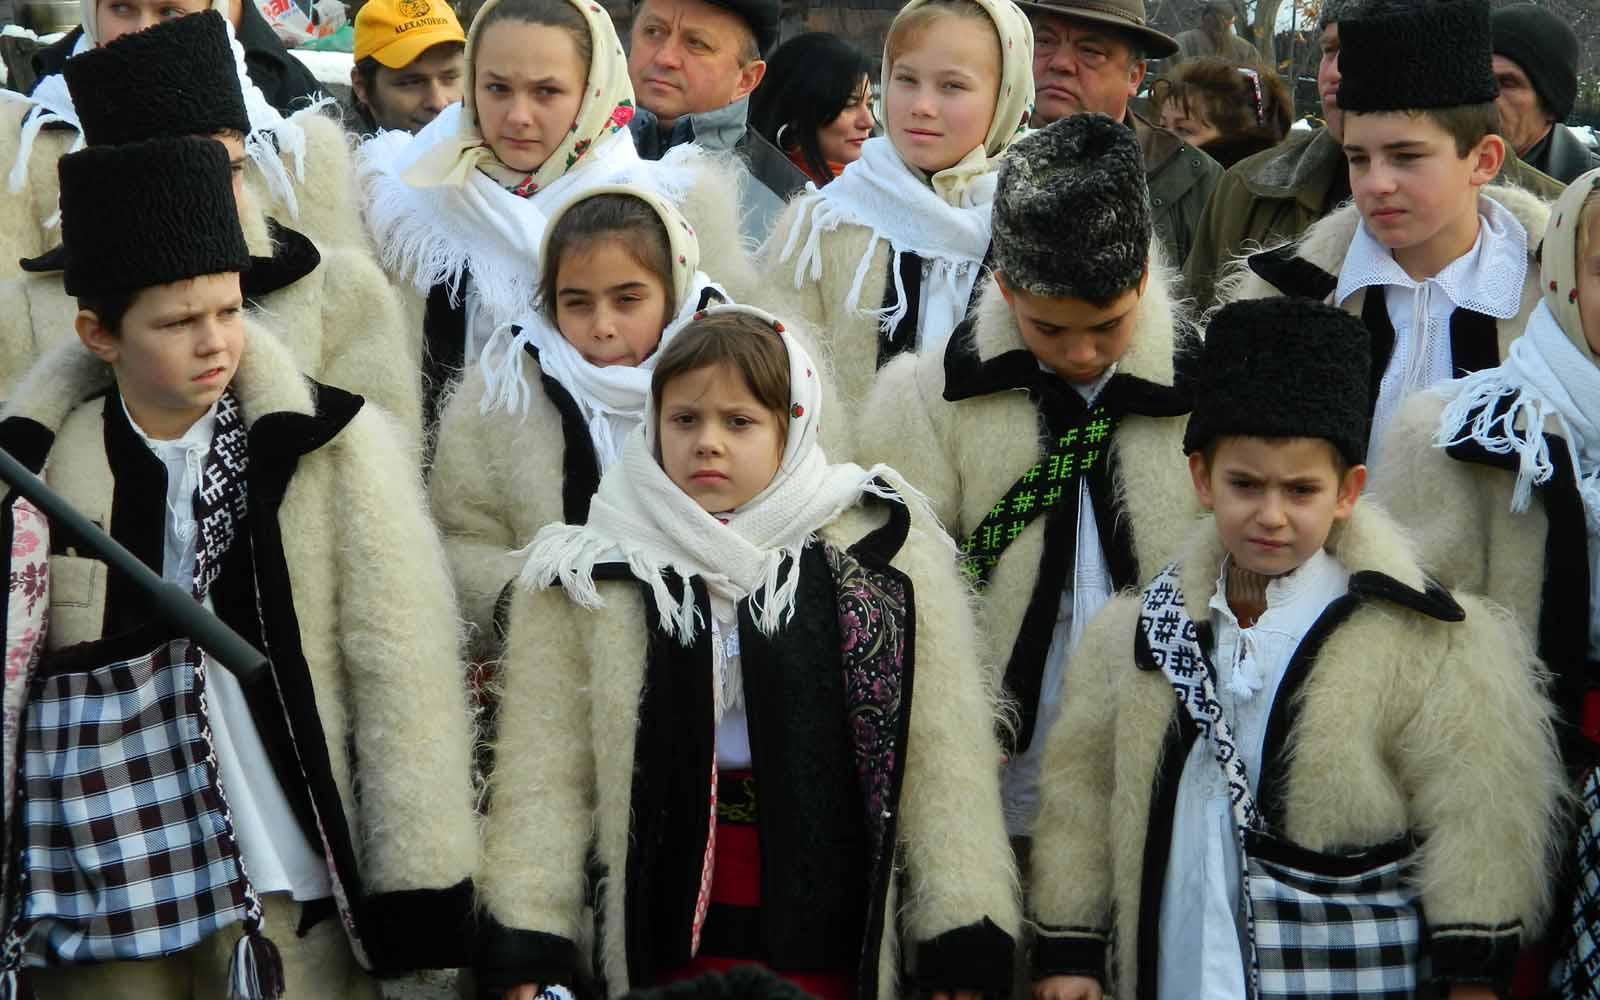 FOTO Craciunul in Transilvania. Intre poveste, traditie, cantat si multa veselie.